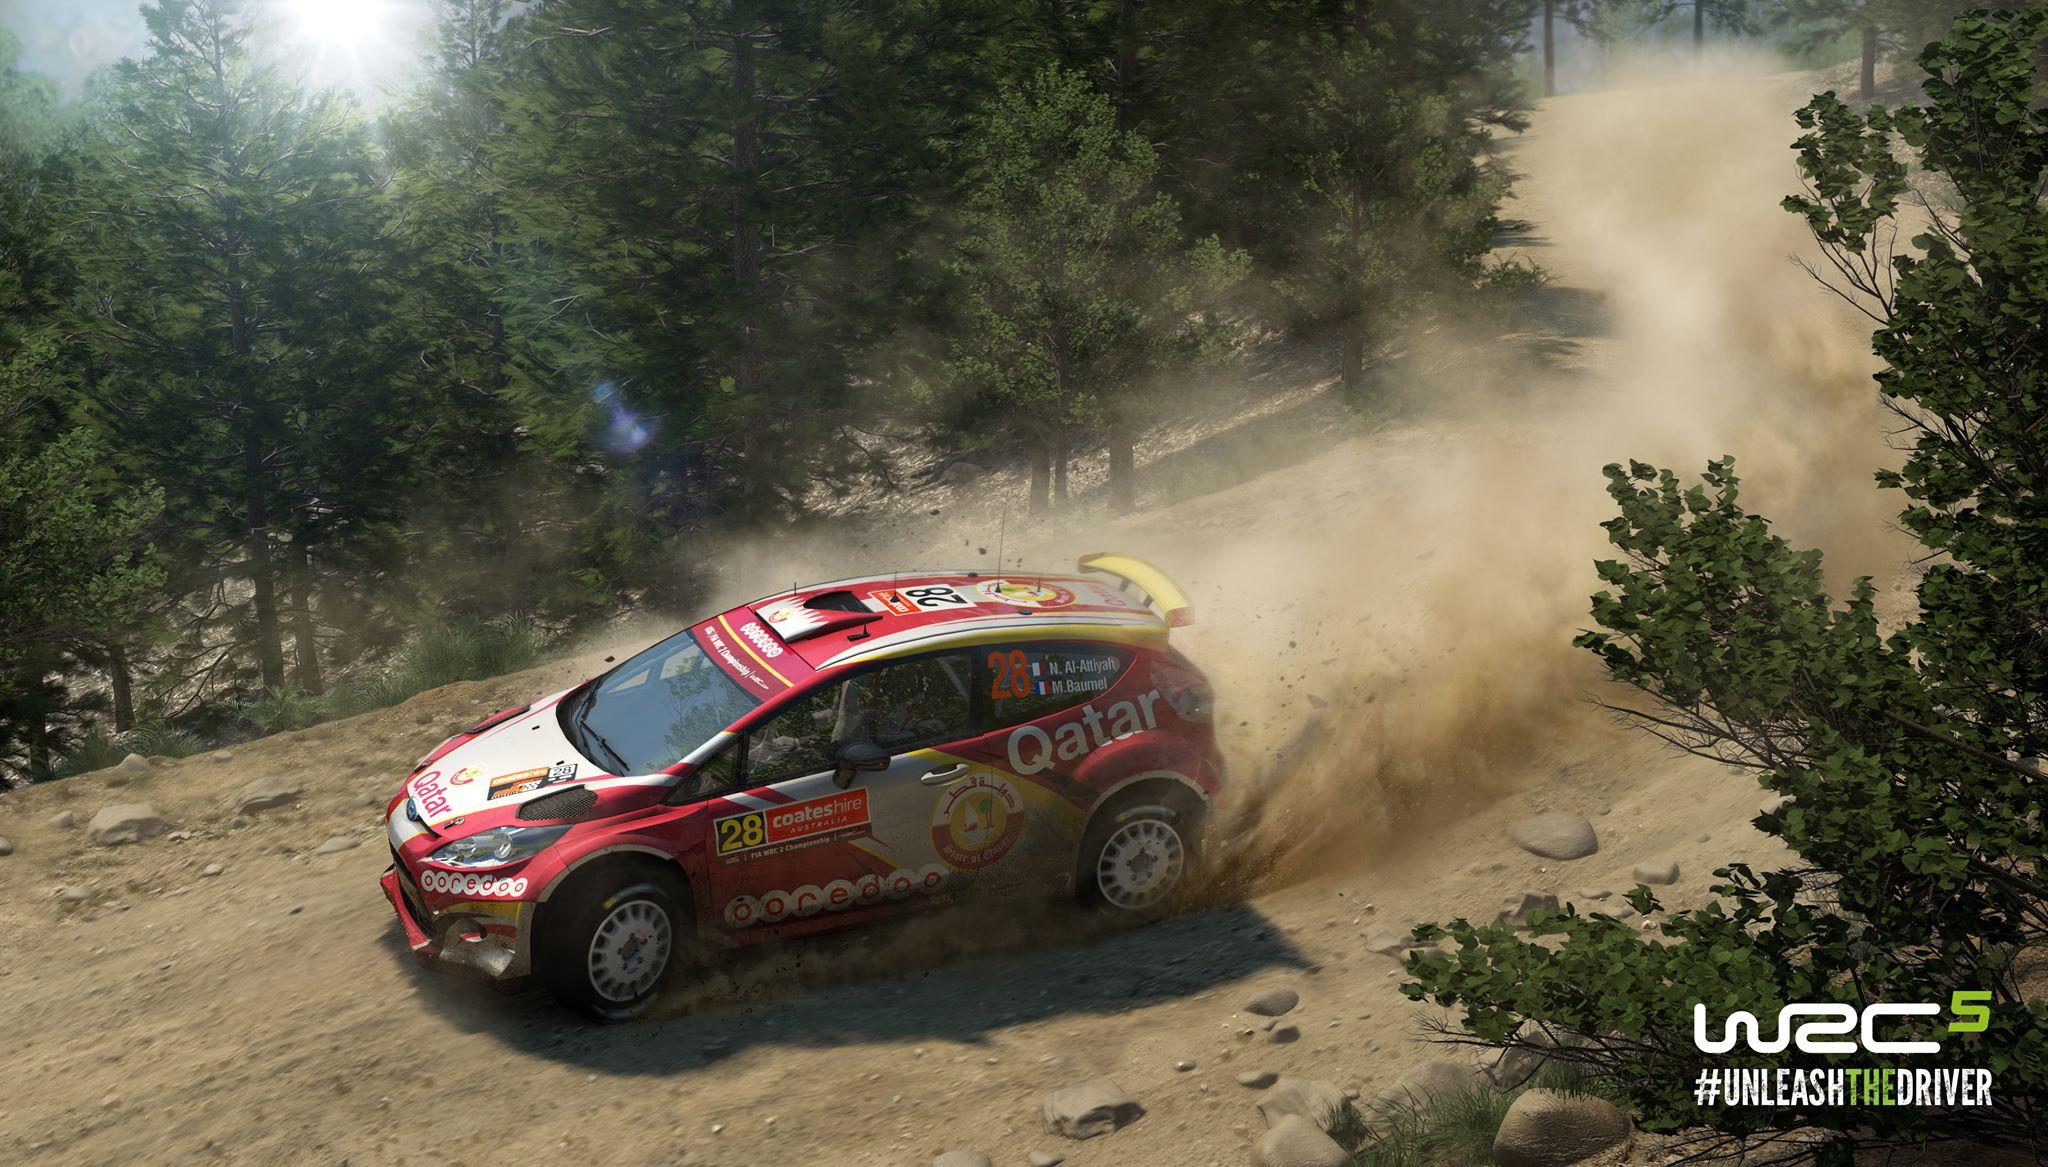 Wrc 5 fia world rally championship обзор